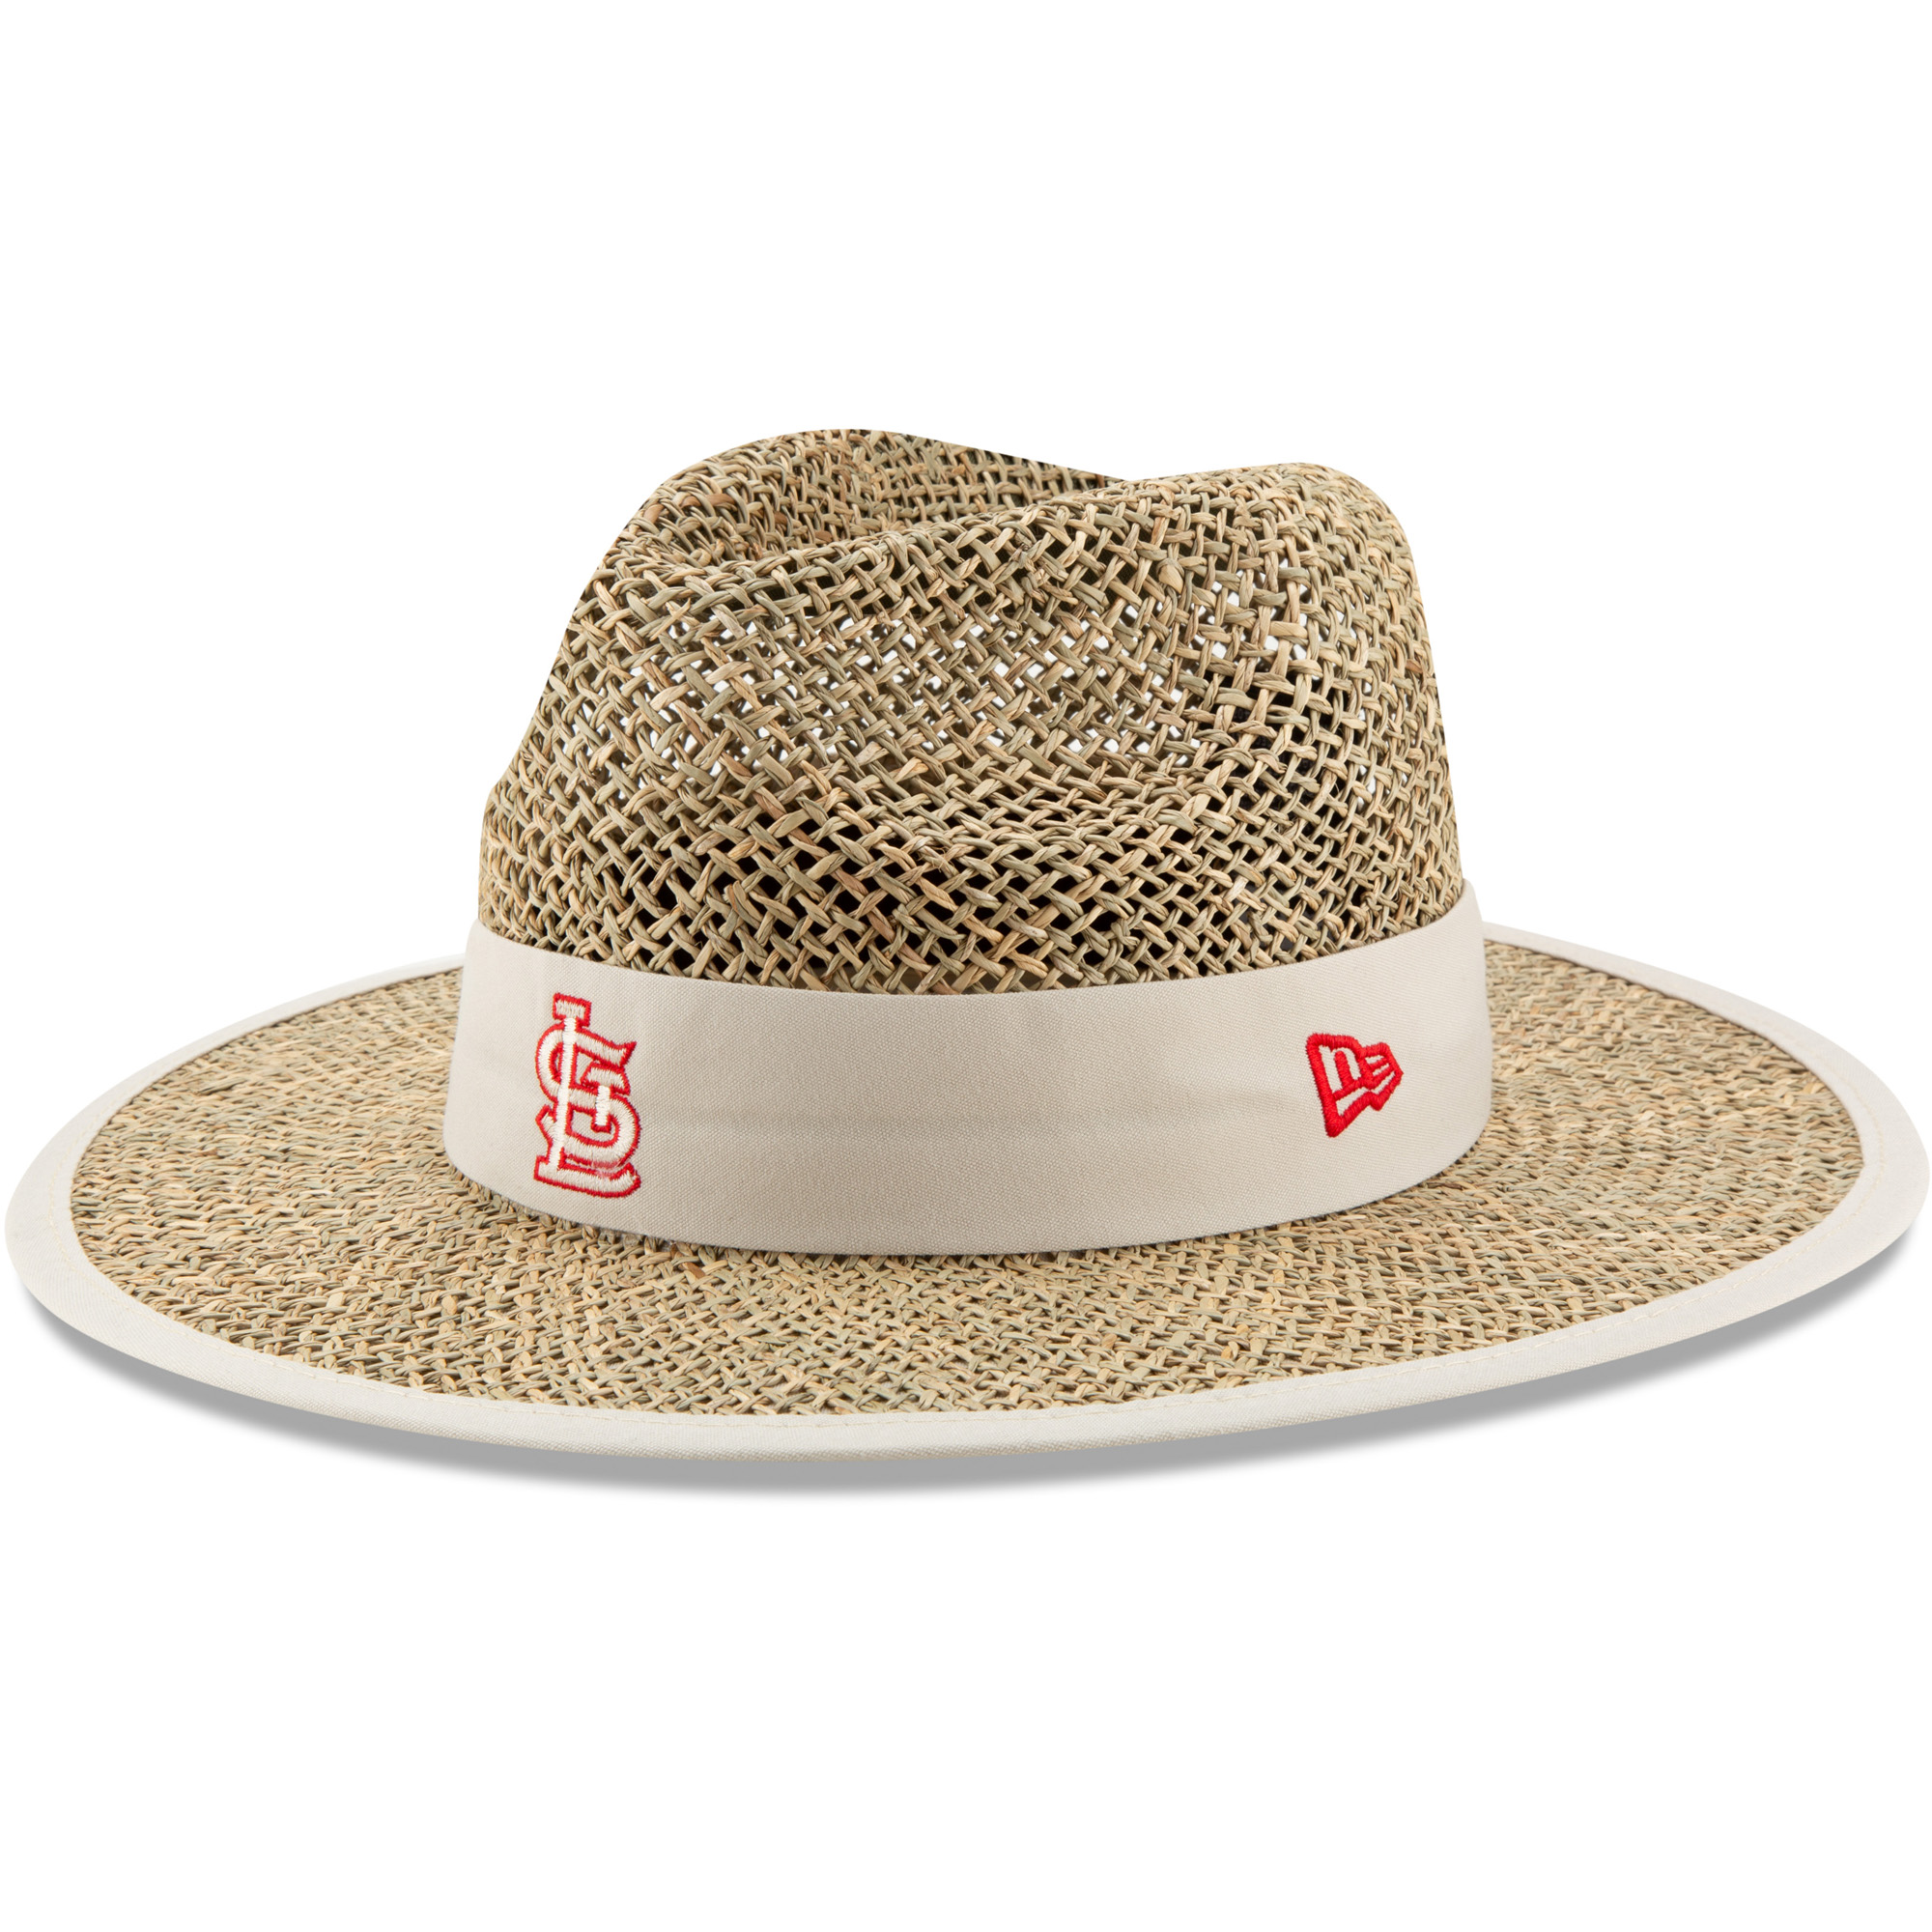 St. Louis Cardinals New Era Shaded Straw Hat - Tan - OSFA